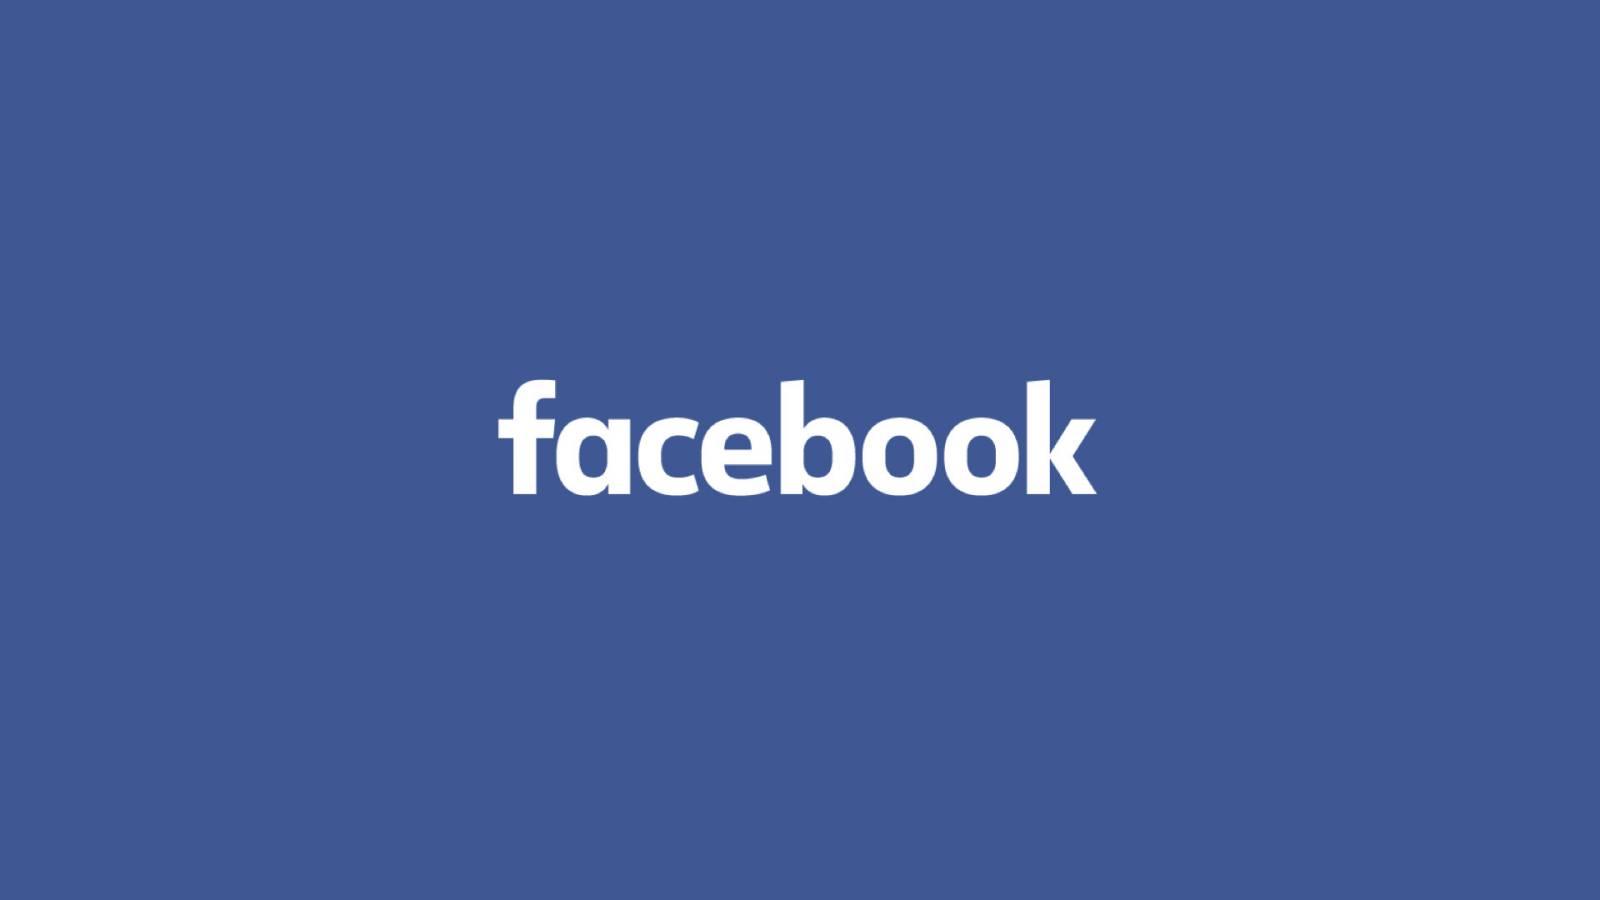 Facebook Update nou Lansat Telefoane Tablete Azi